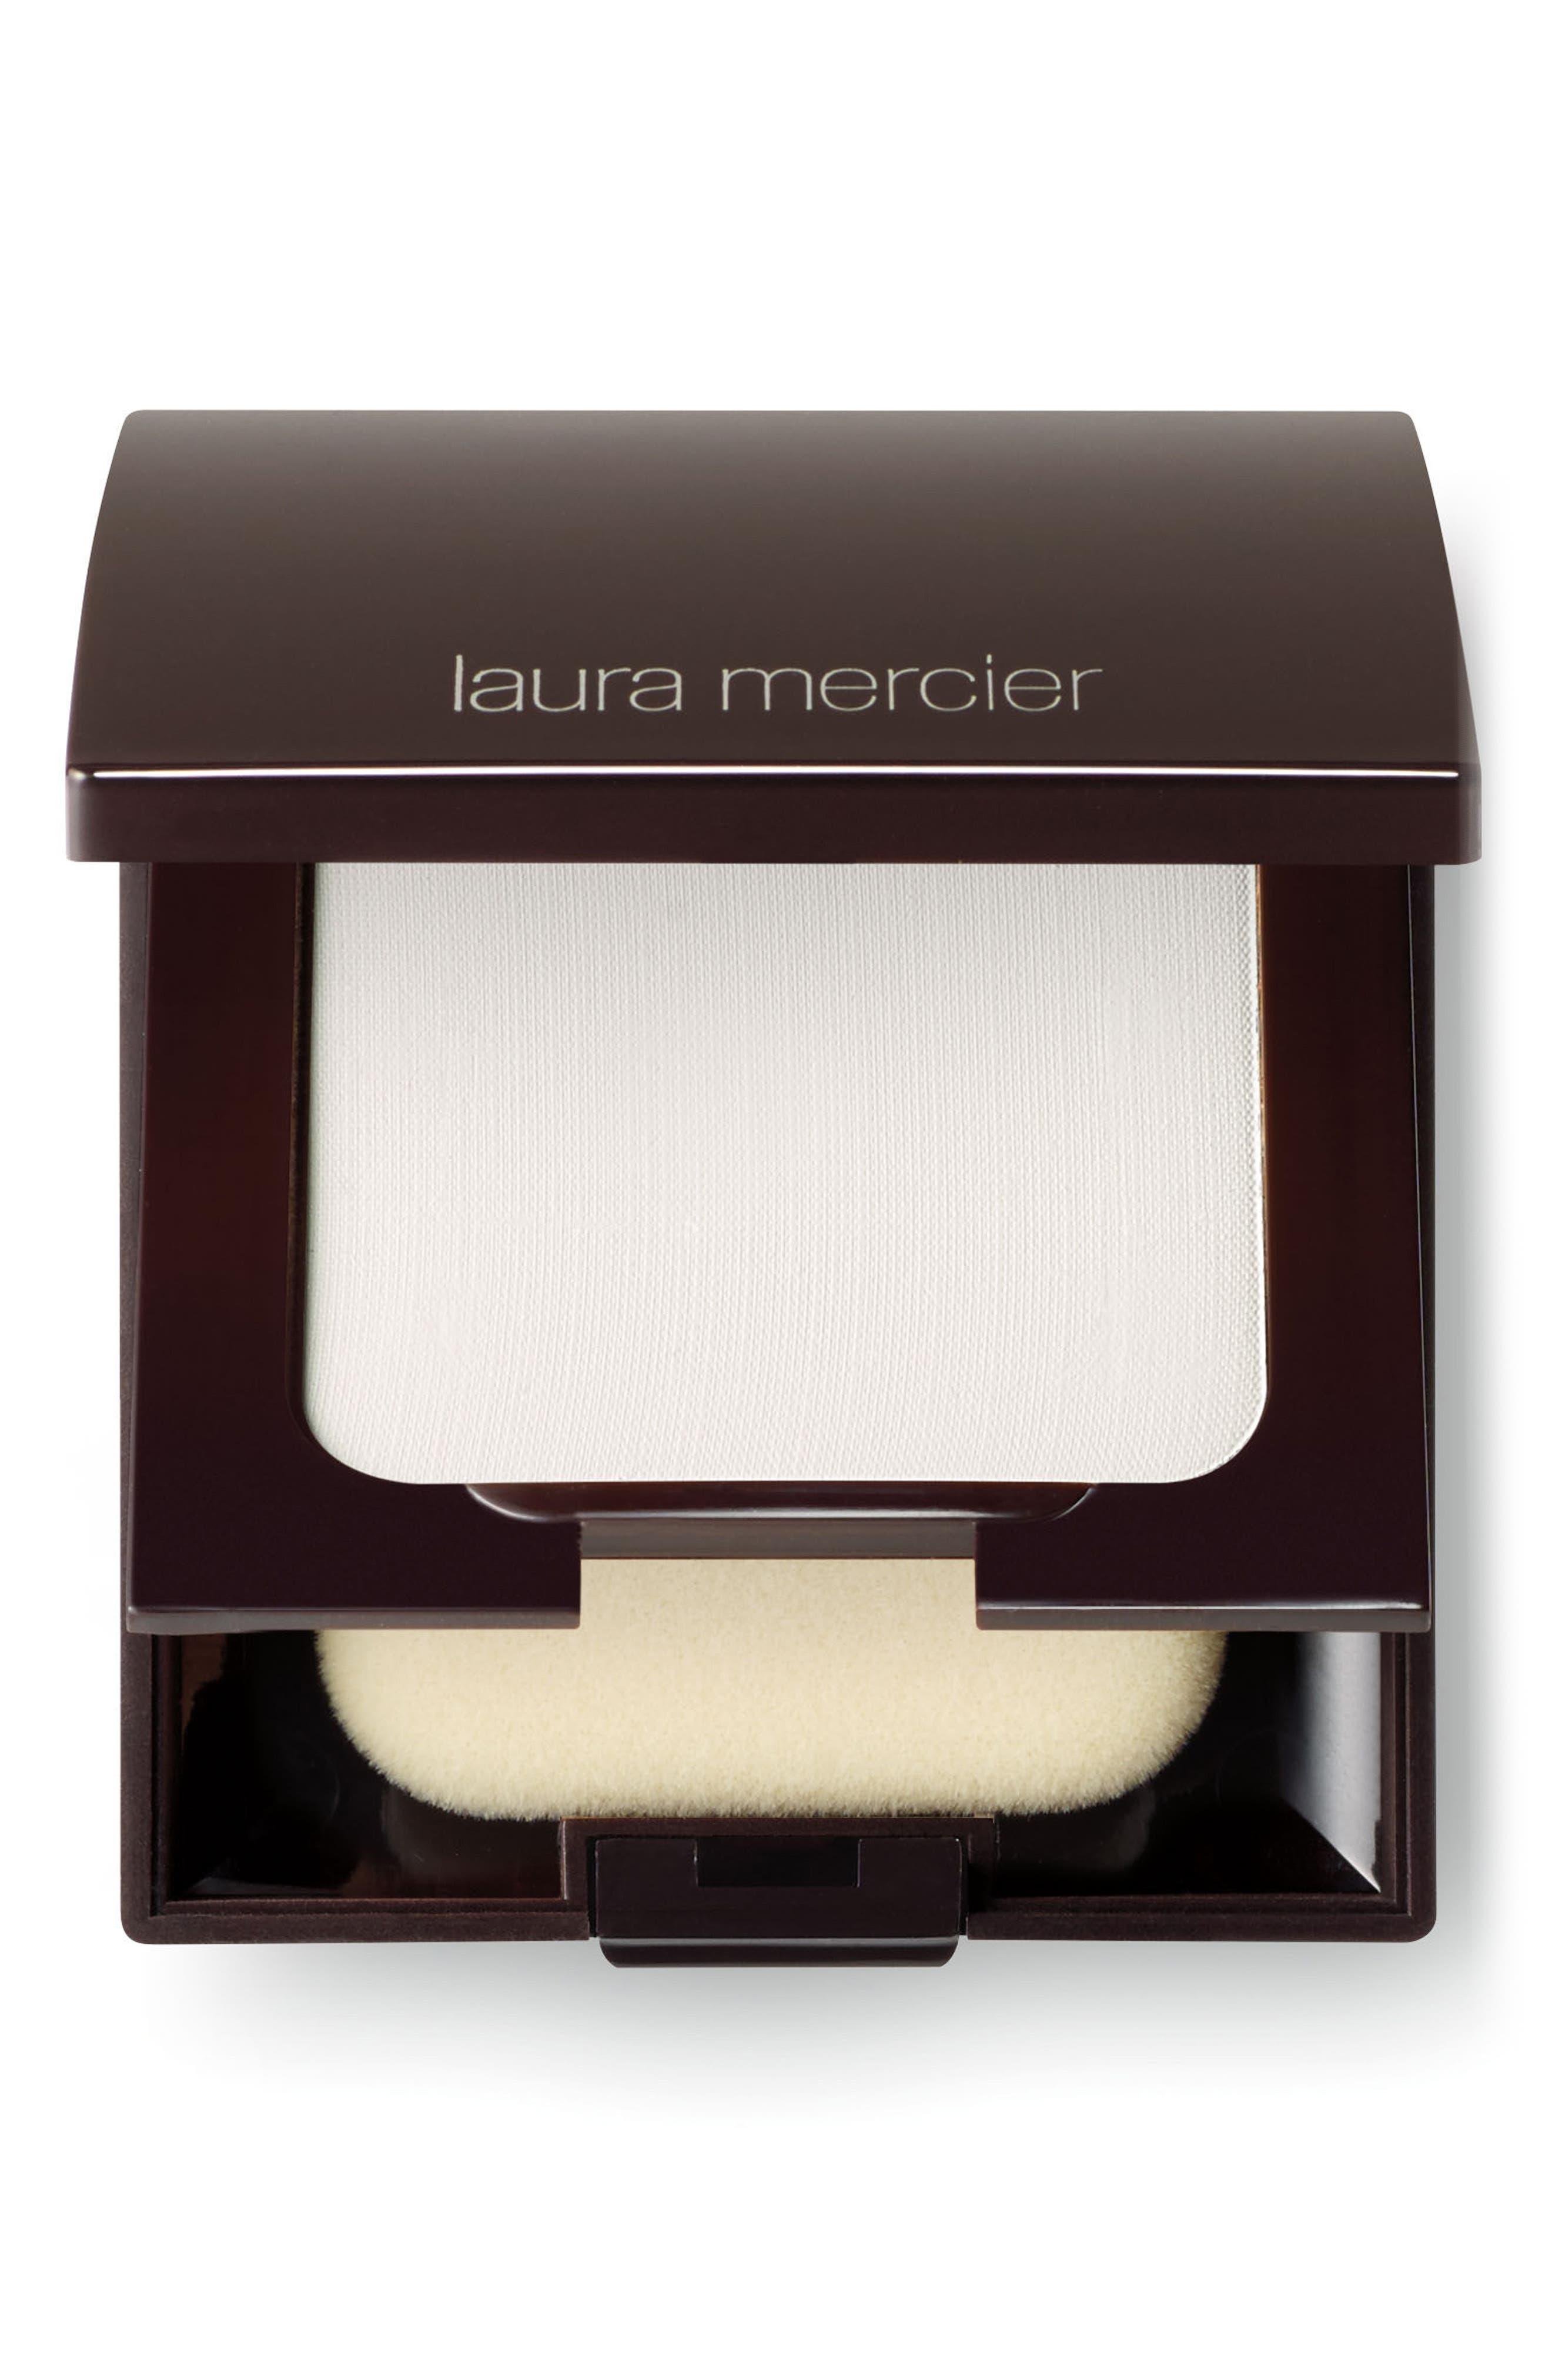 Main Image - Laura Mercier Invisible Pressed Powder Compact